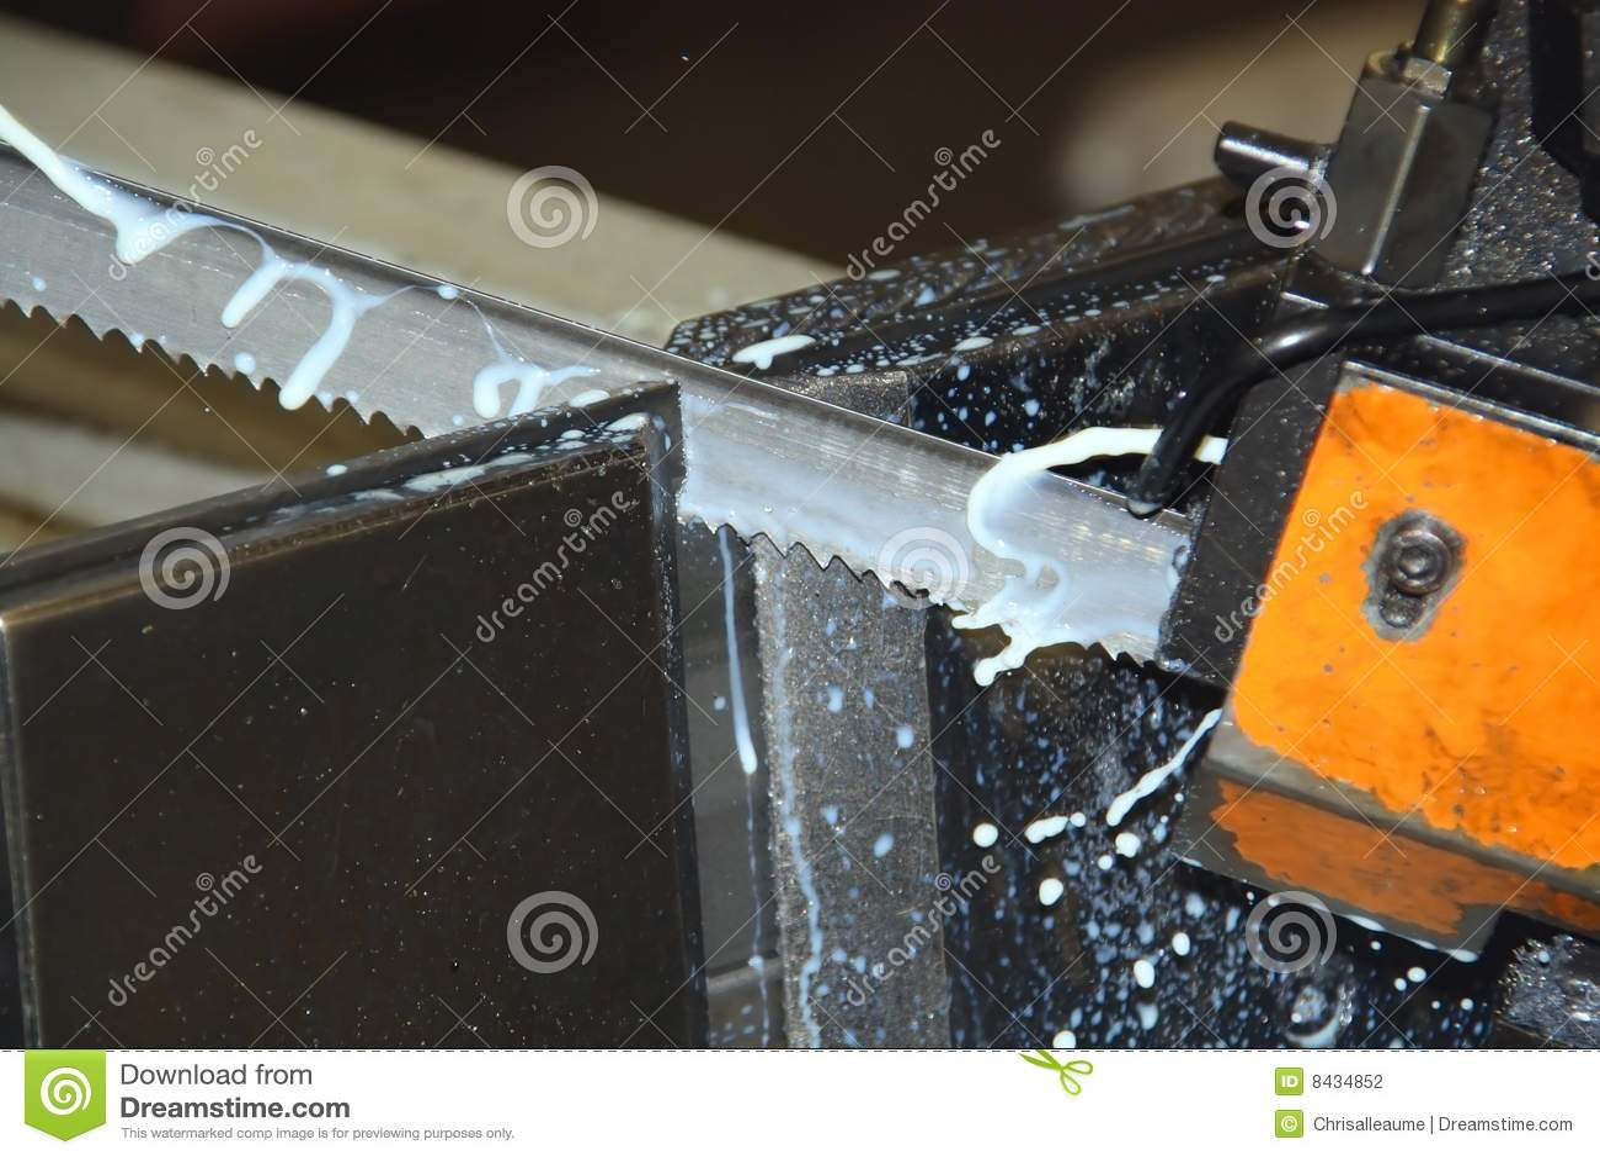 Industrial bandsaw cutting metal